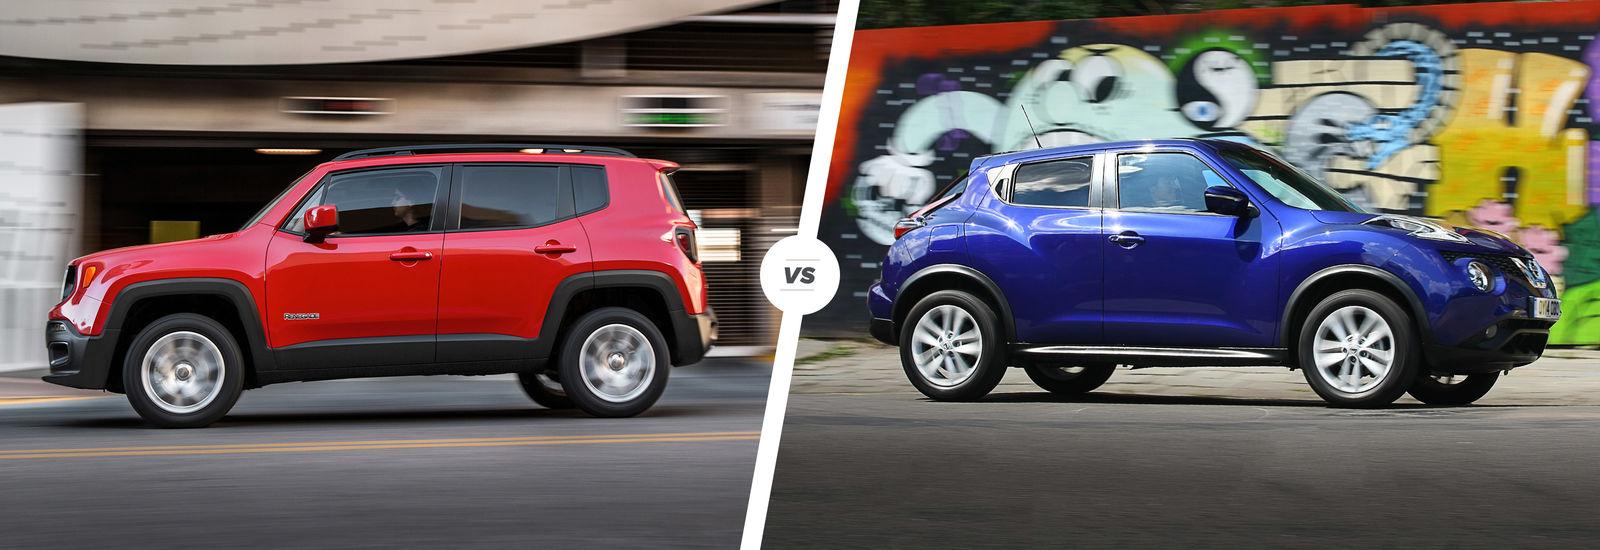 jeep renegade vs nissan juke crossover clash carwow. Black Bedroom Furniture Sets. Home Design Ideas